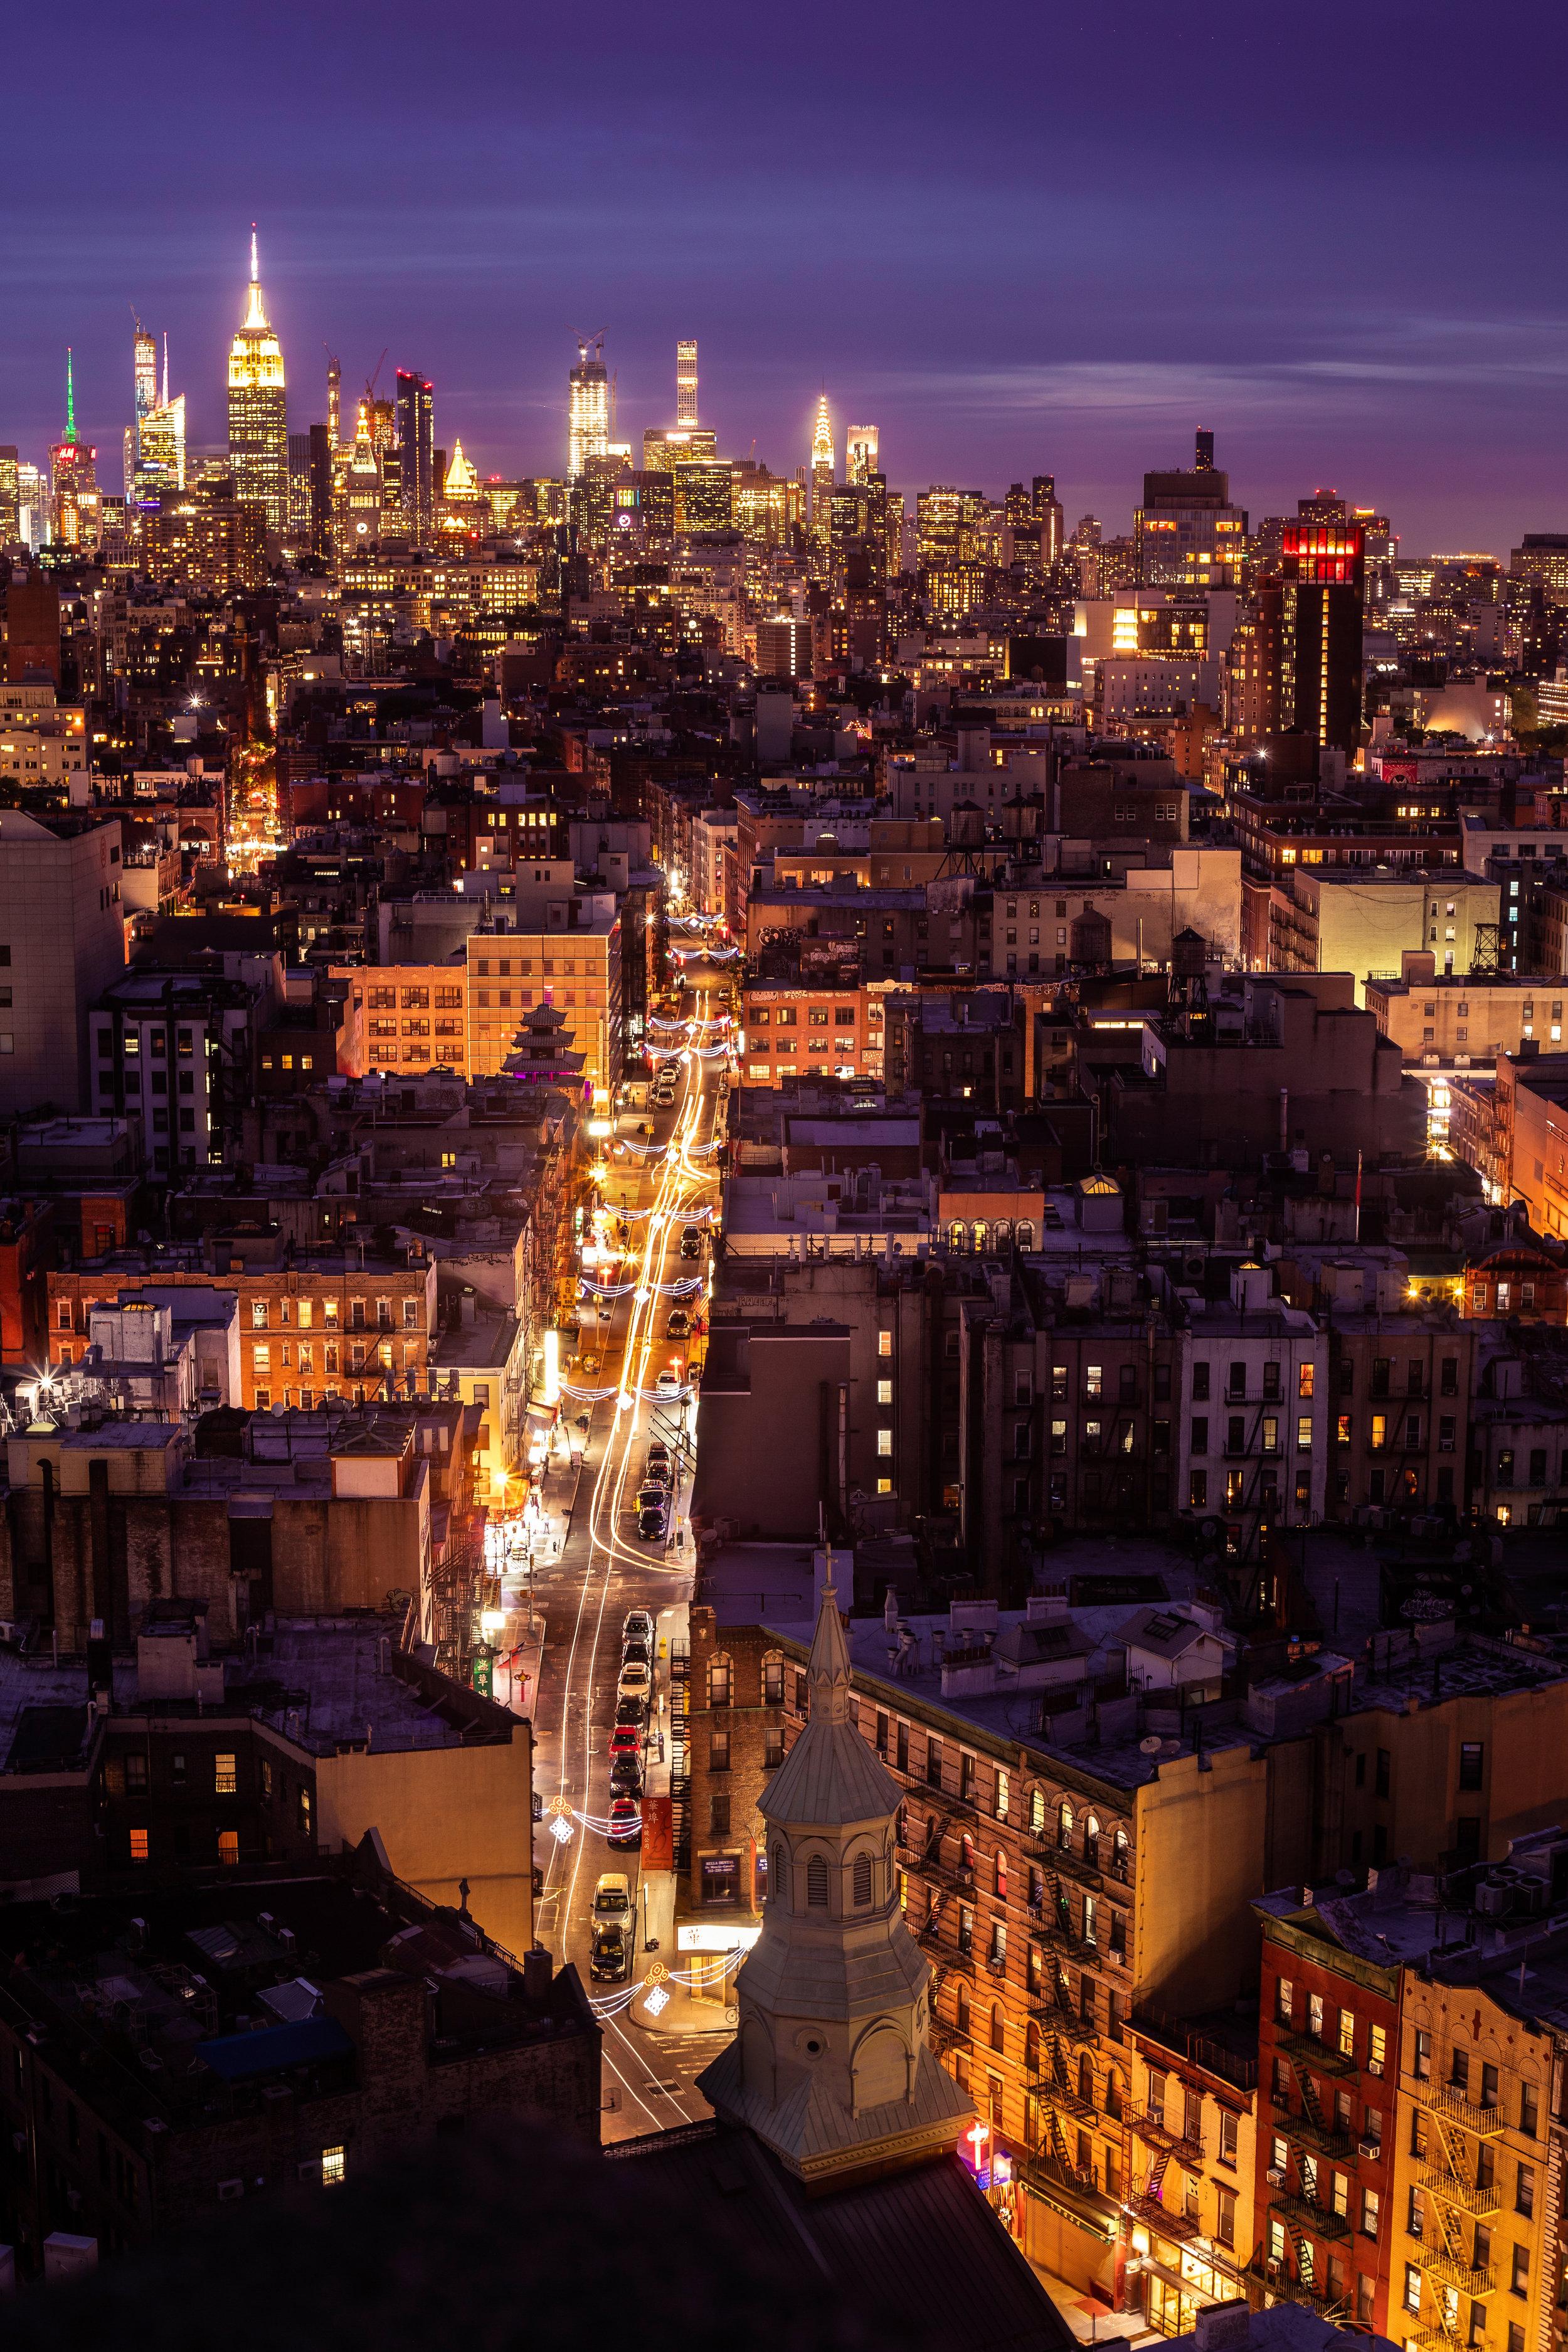 Chinatown Roof Long Exposure.jpg